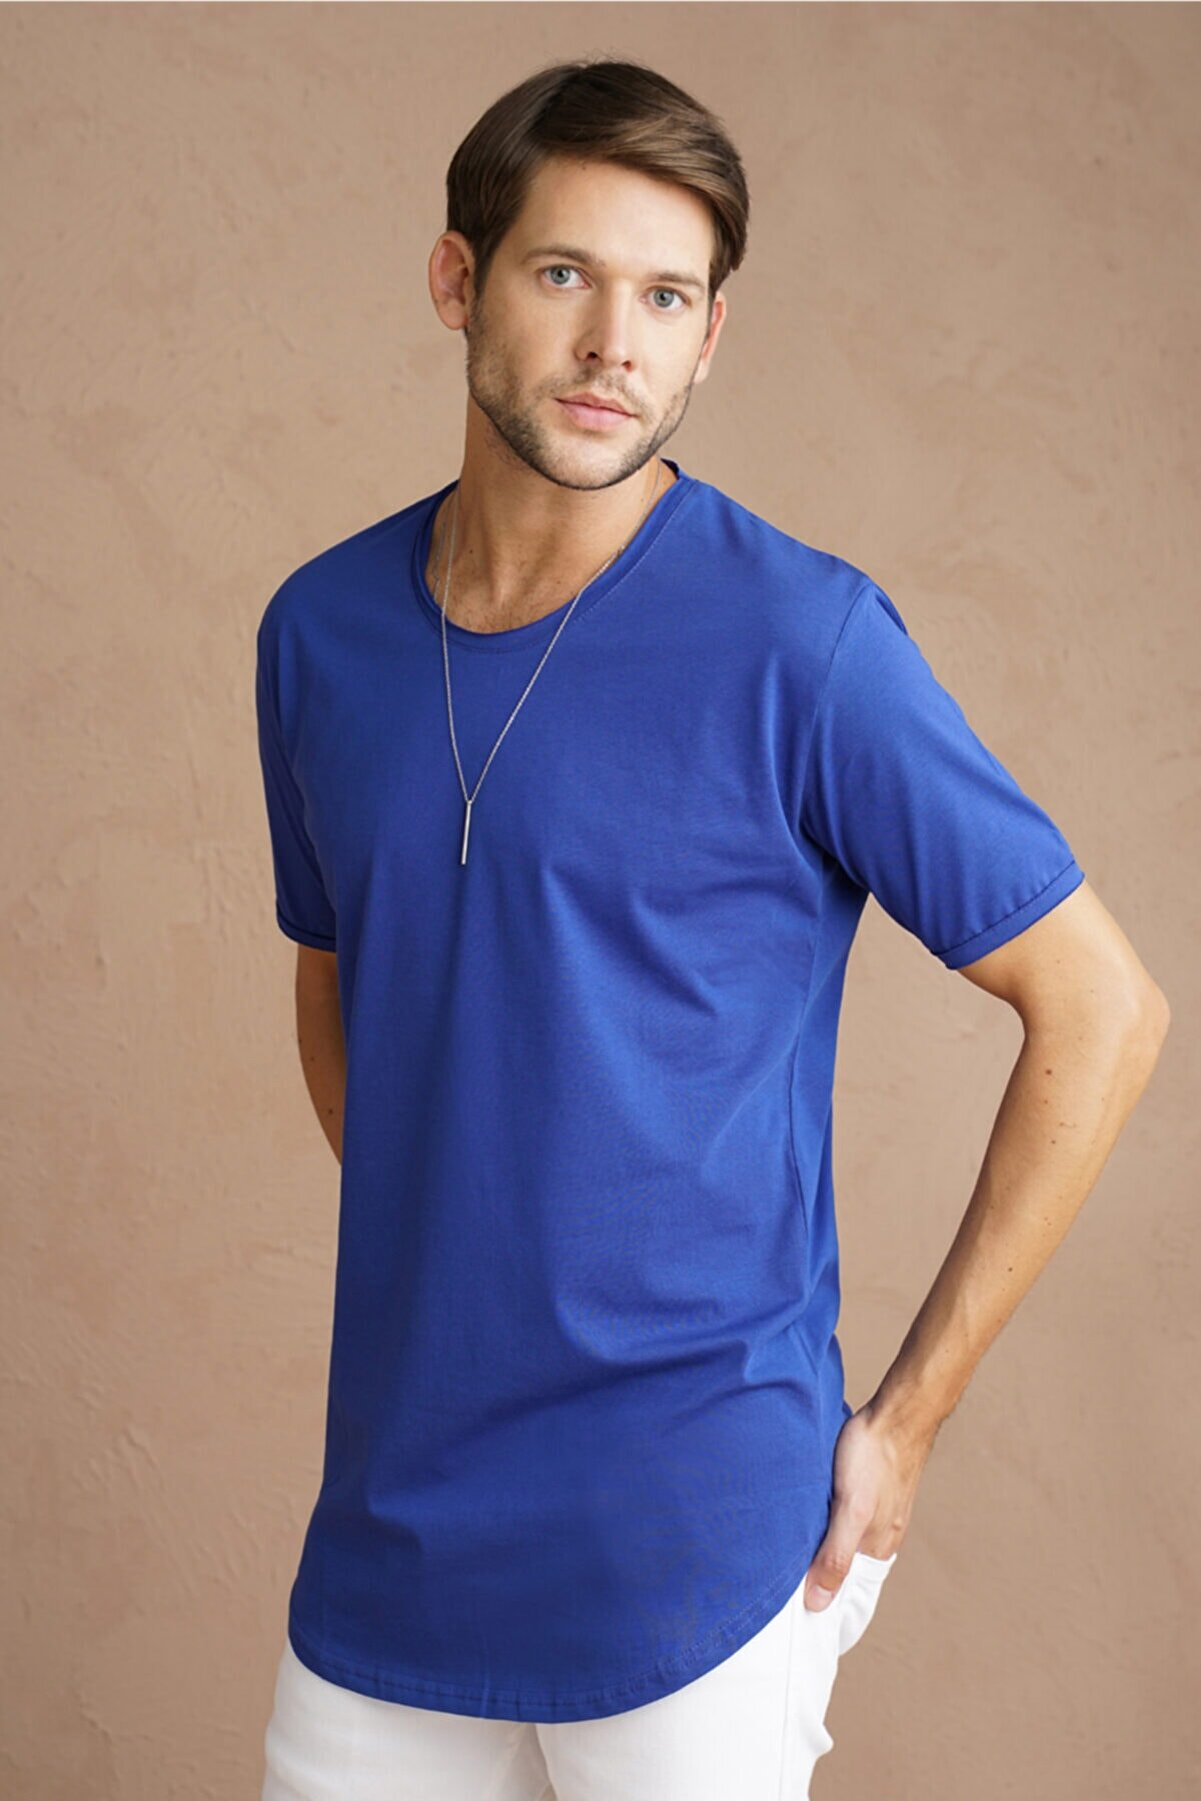 Tarz Cool Erkek Mavi Pis Yaka Salaş T-shirt